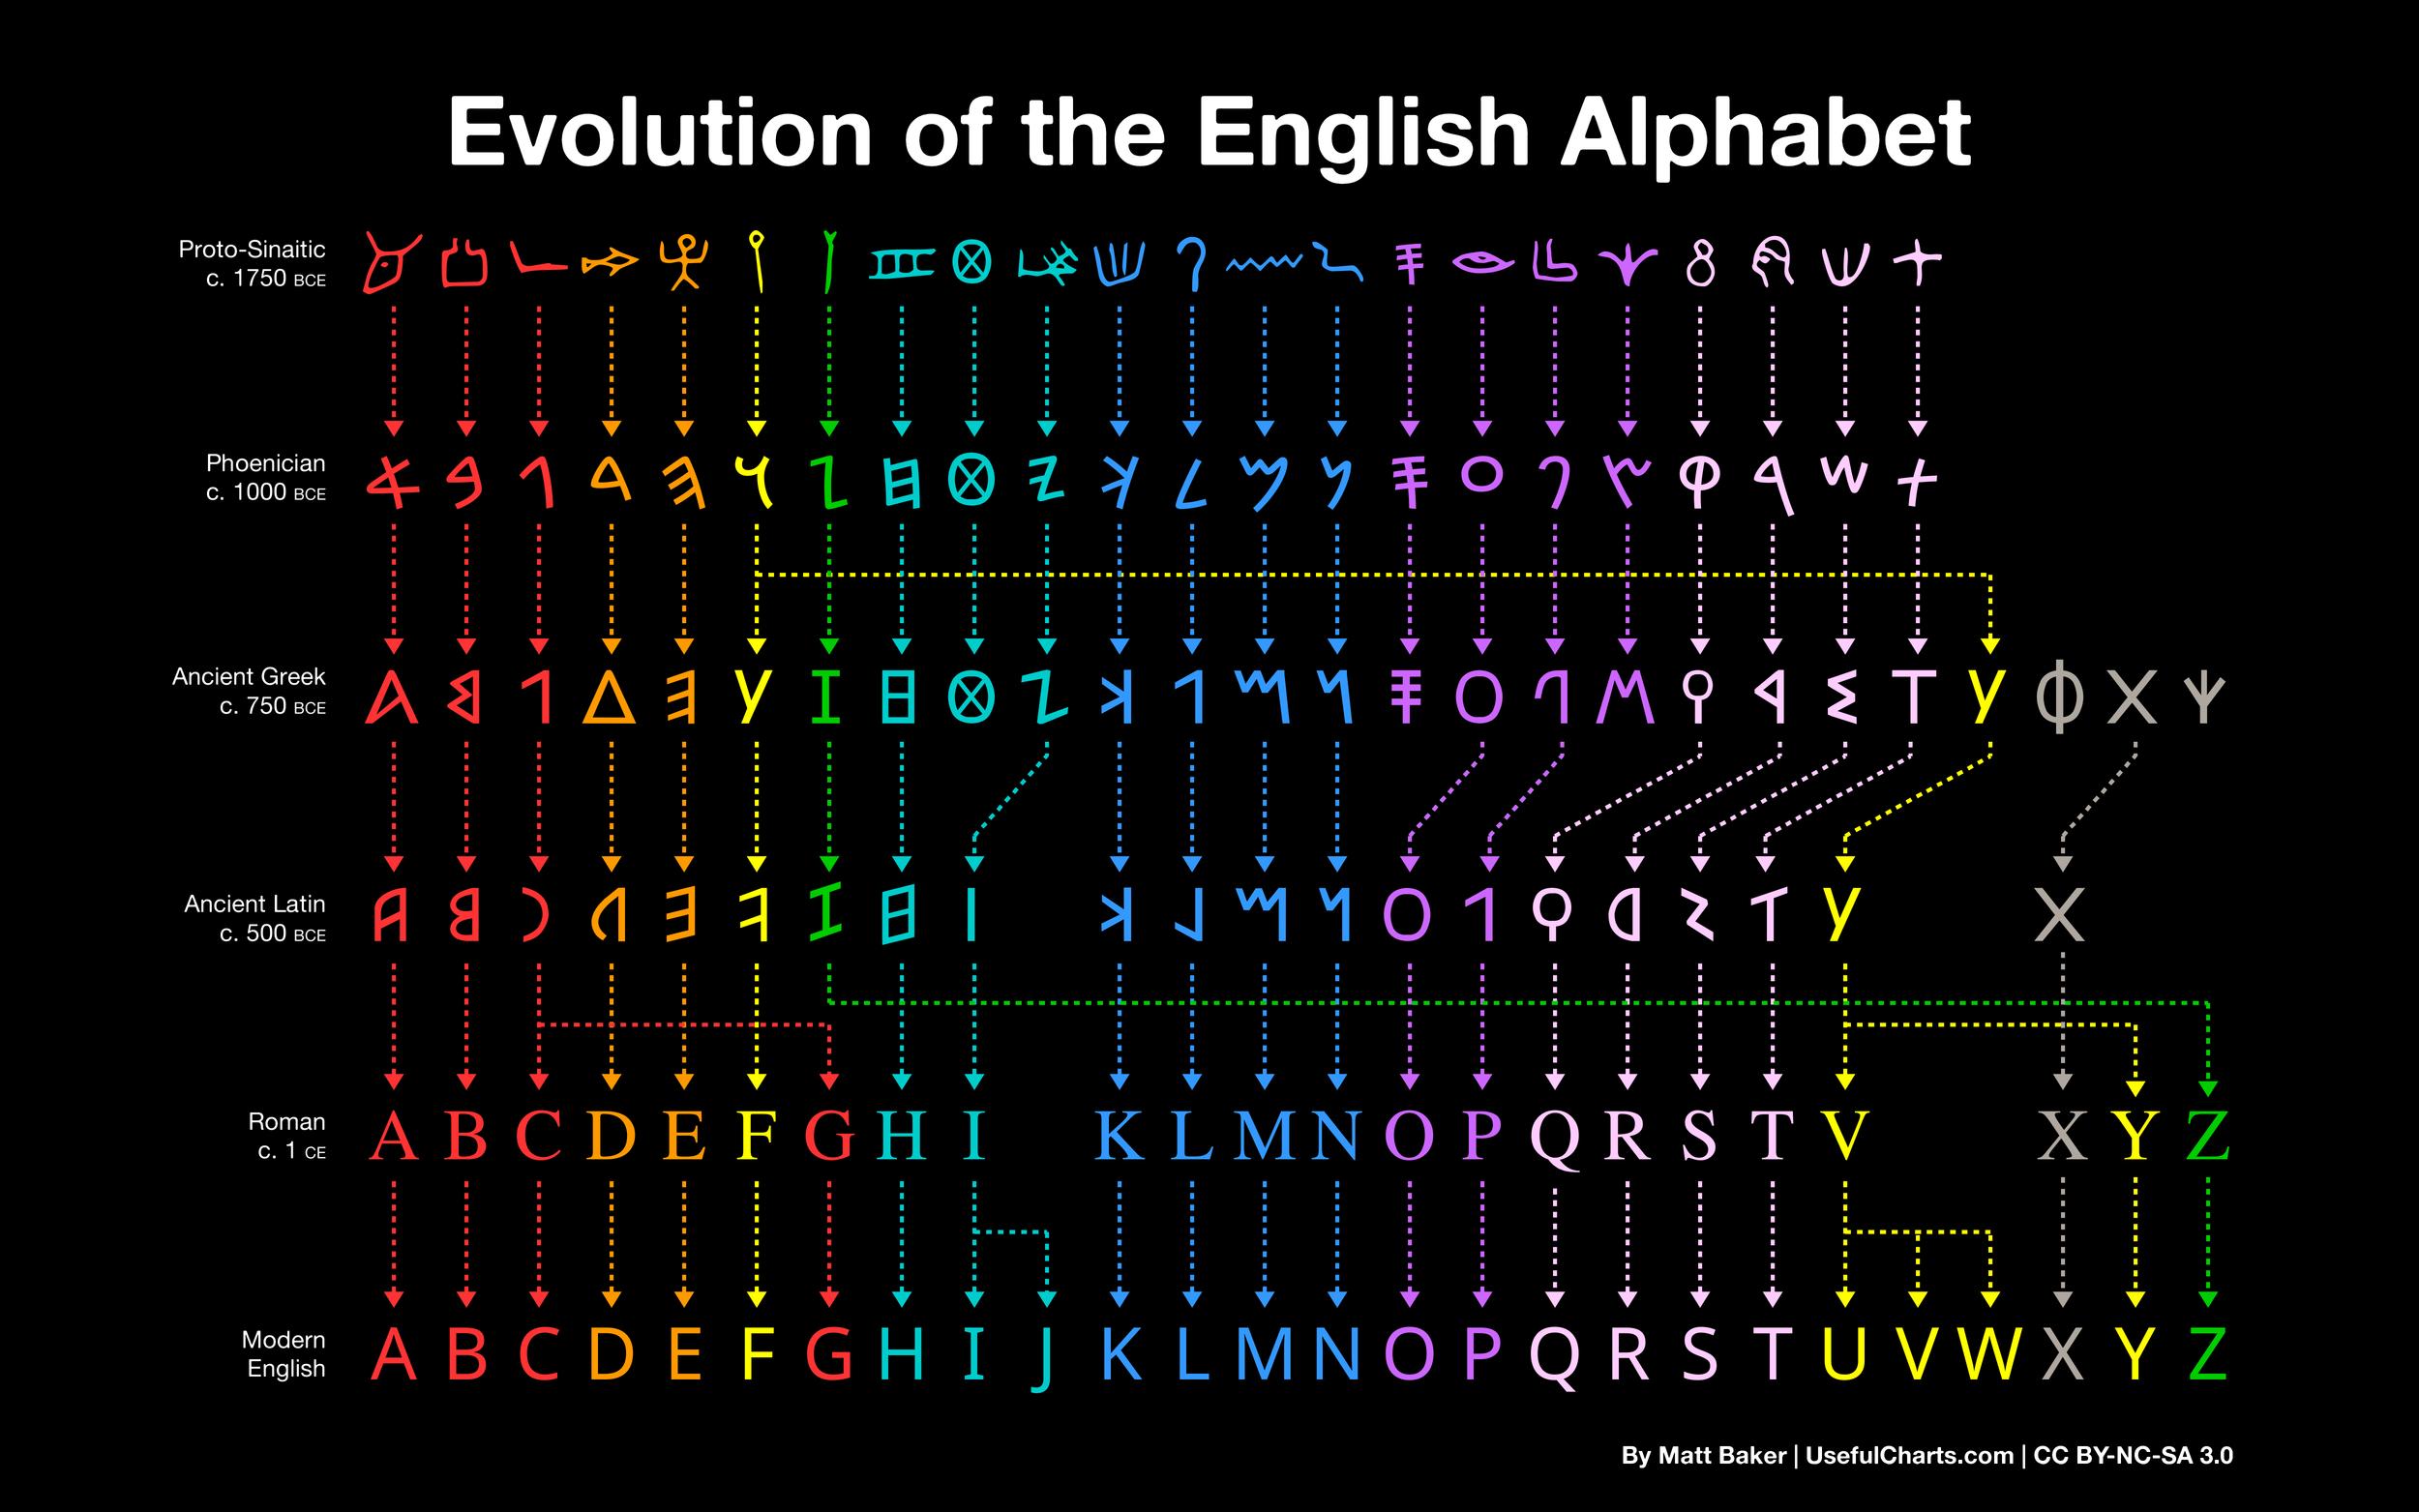 Evolution of the English Alphabet infographic